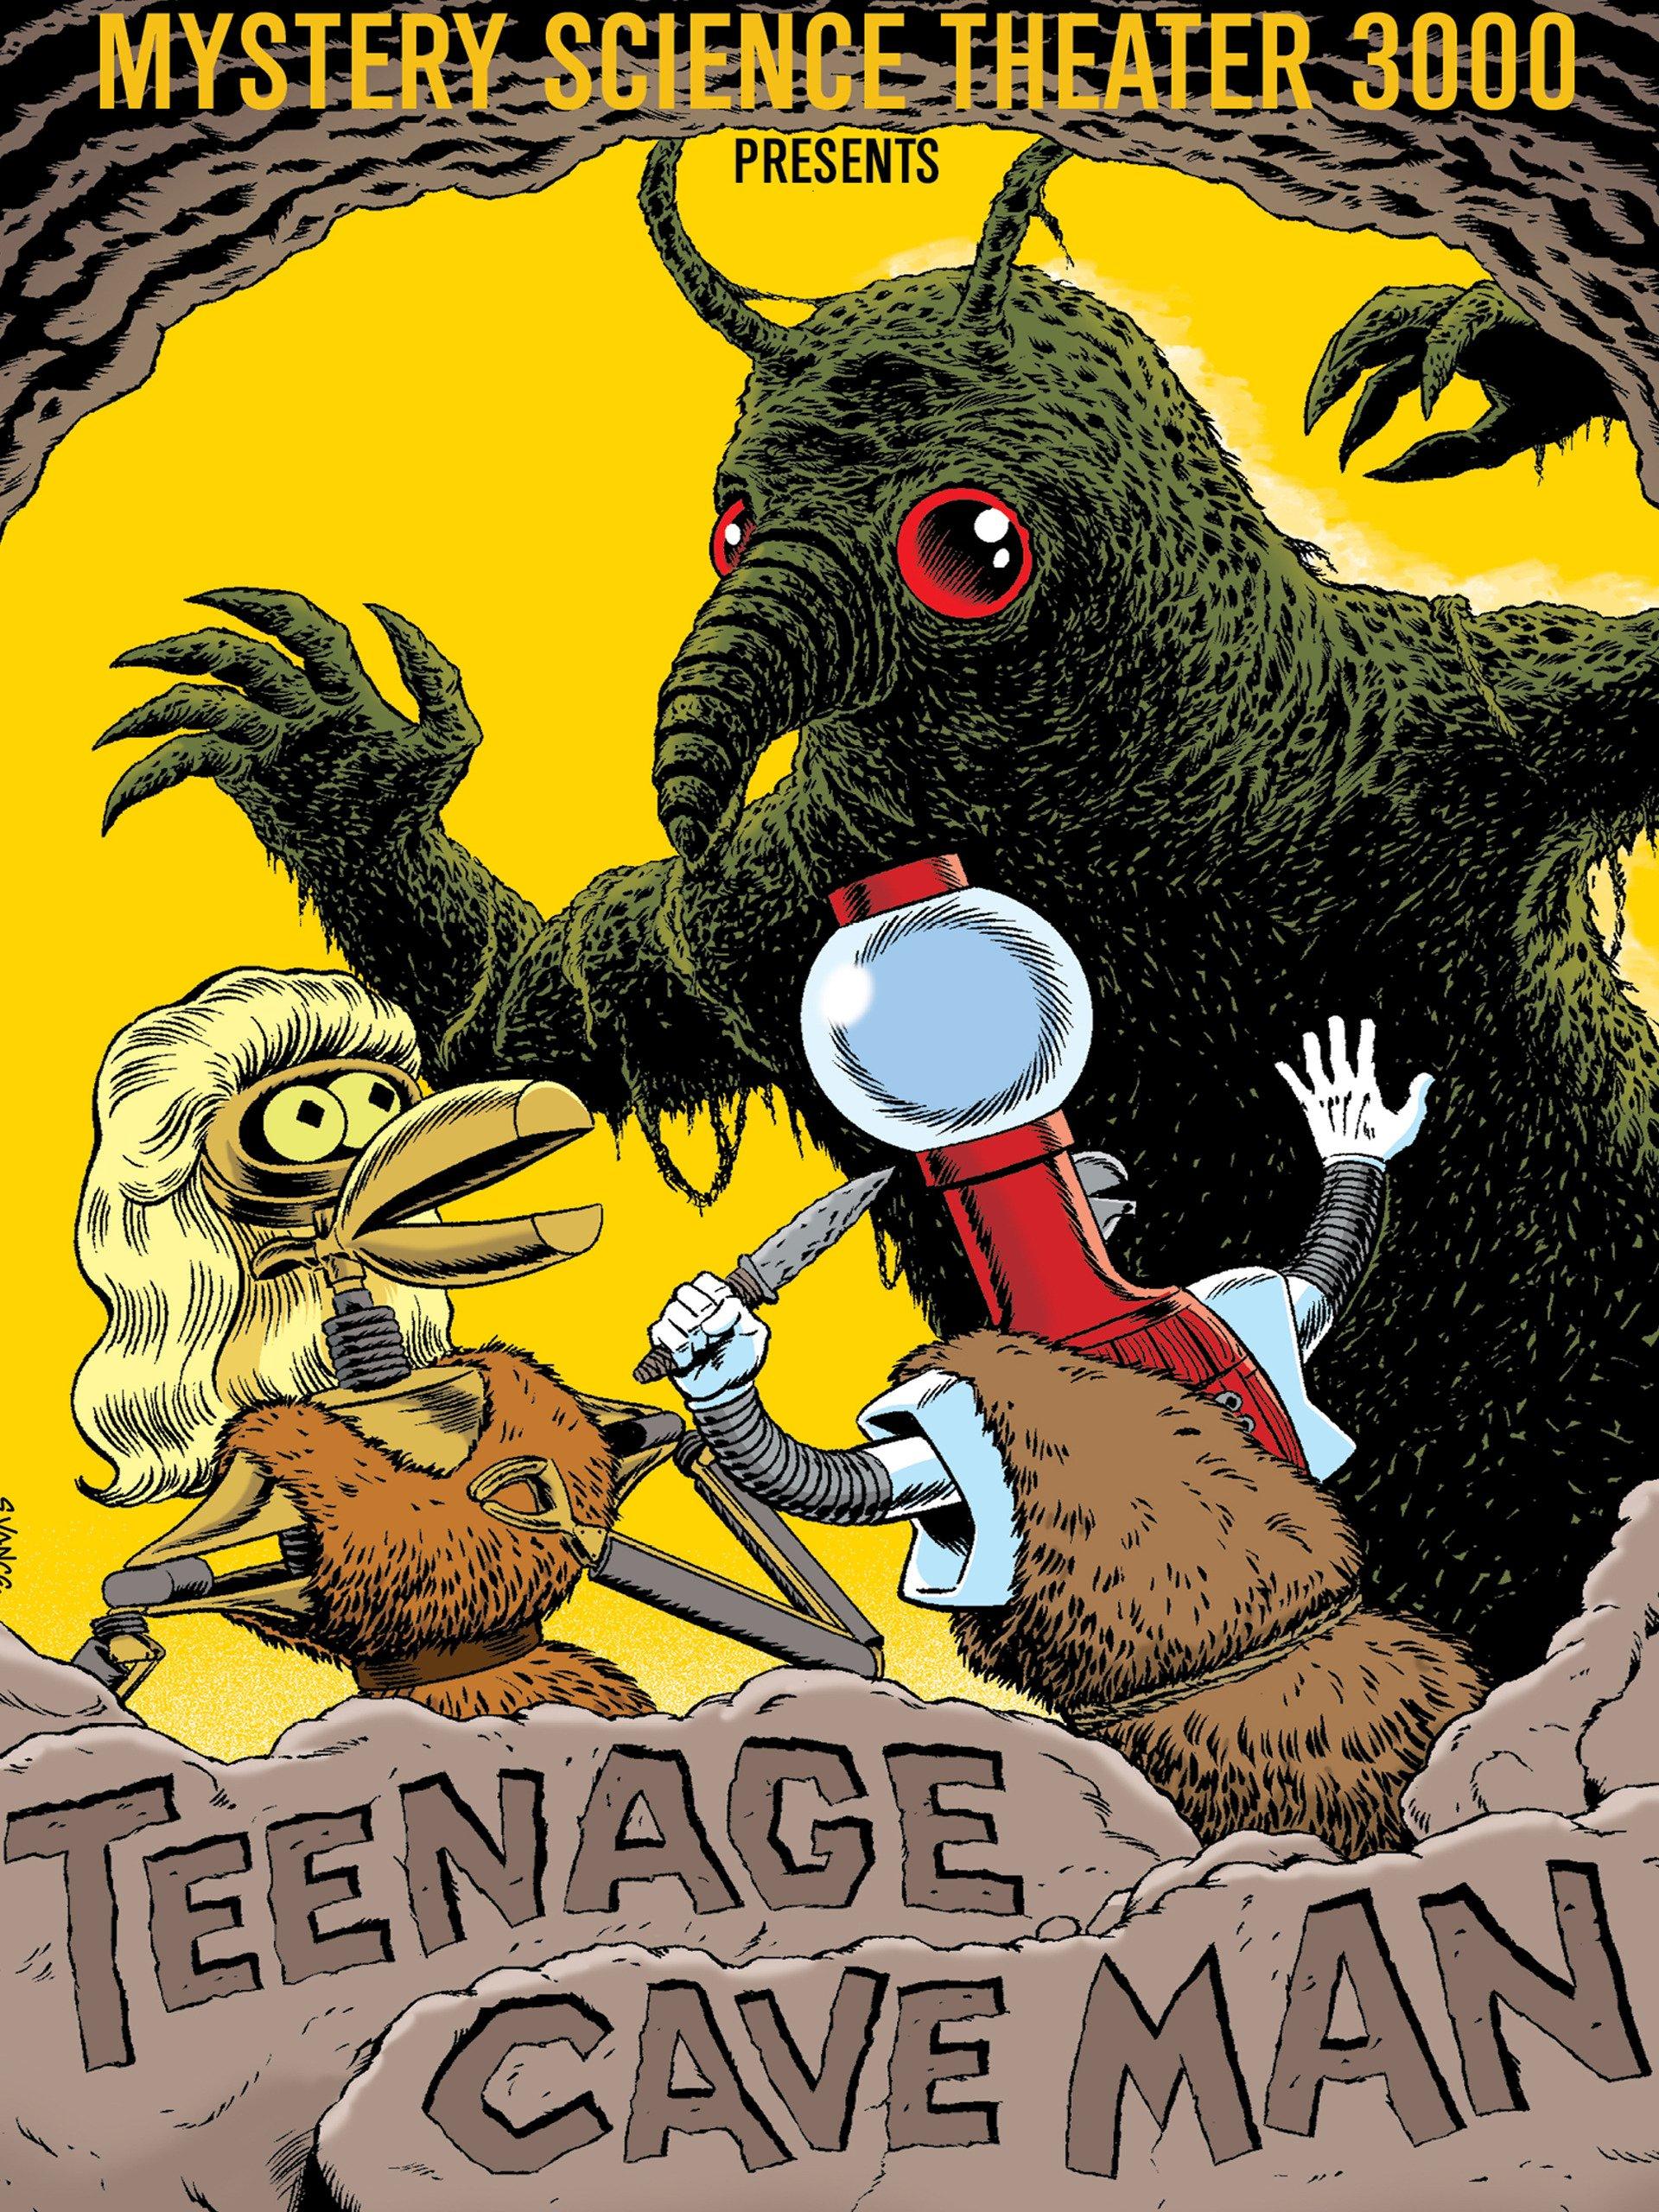 Amazon.com: Watch Mystery Science Theater 3000- Teenage ...